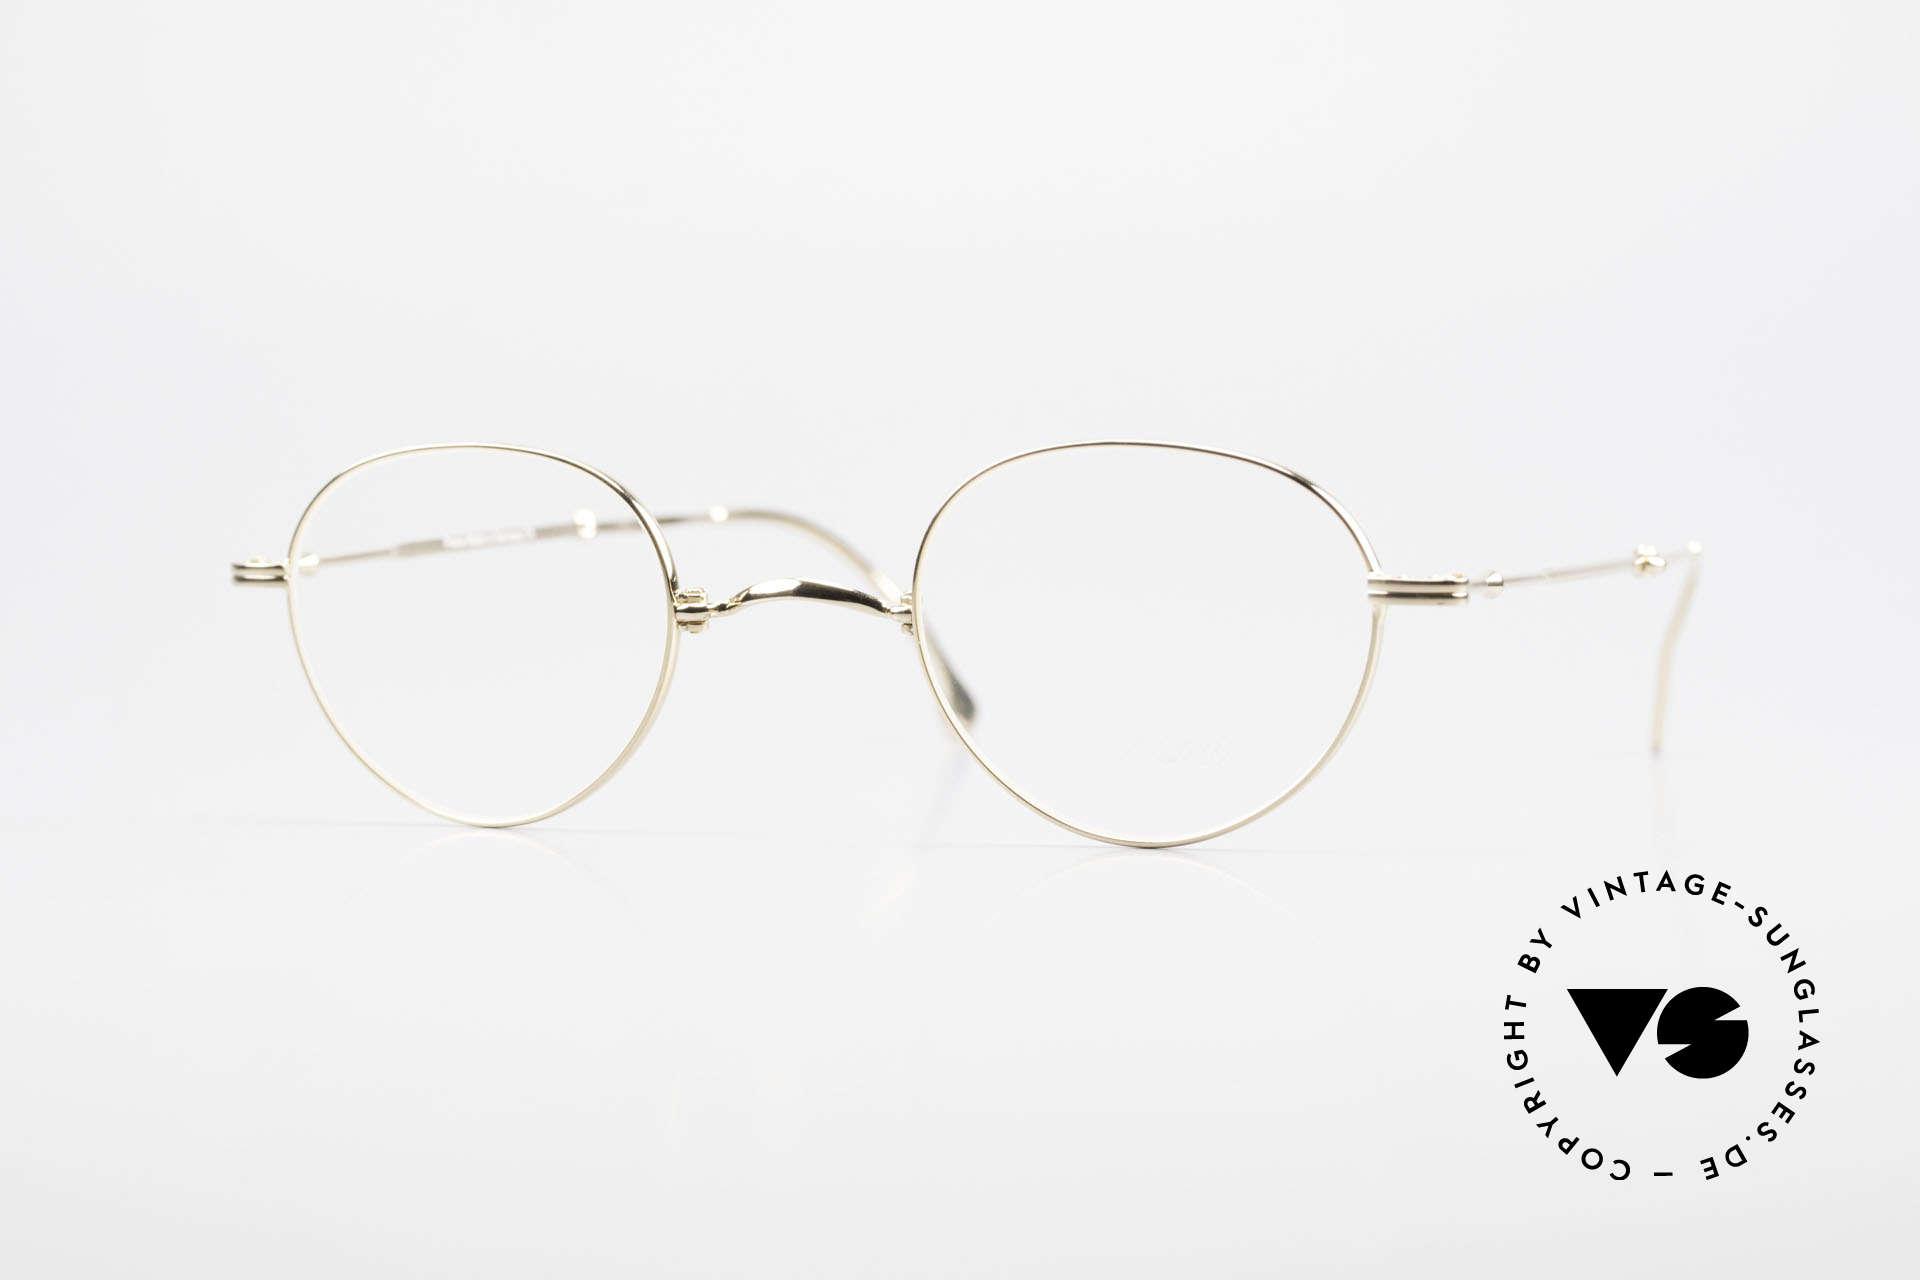 Lunor XXV Folding 03 Lunor Foldable Panto Glasses, old Lunor folding eyeglasses, model XXV 03, size 40/22, Made for Men and Women